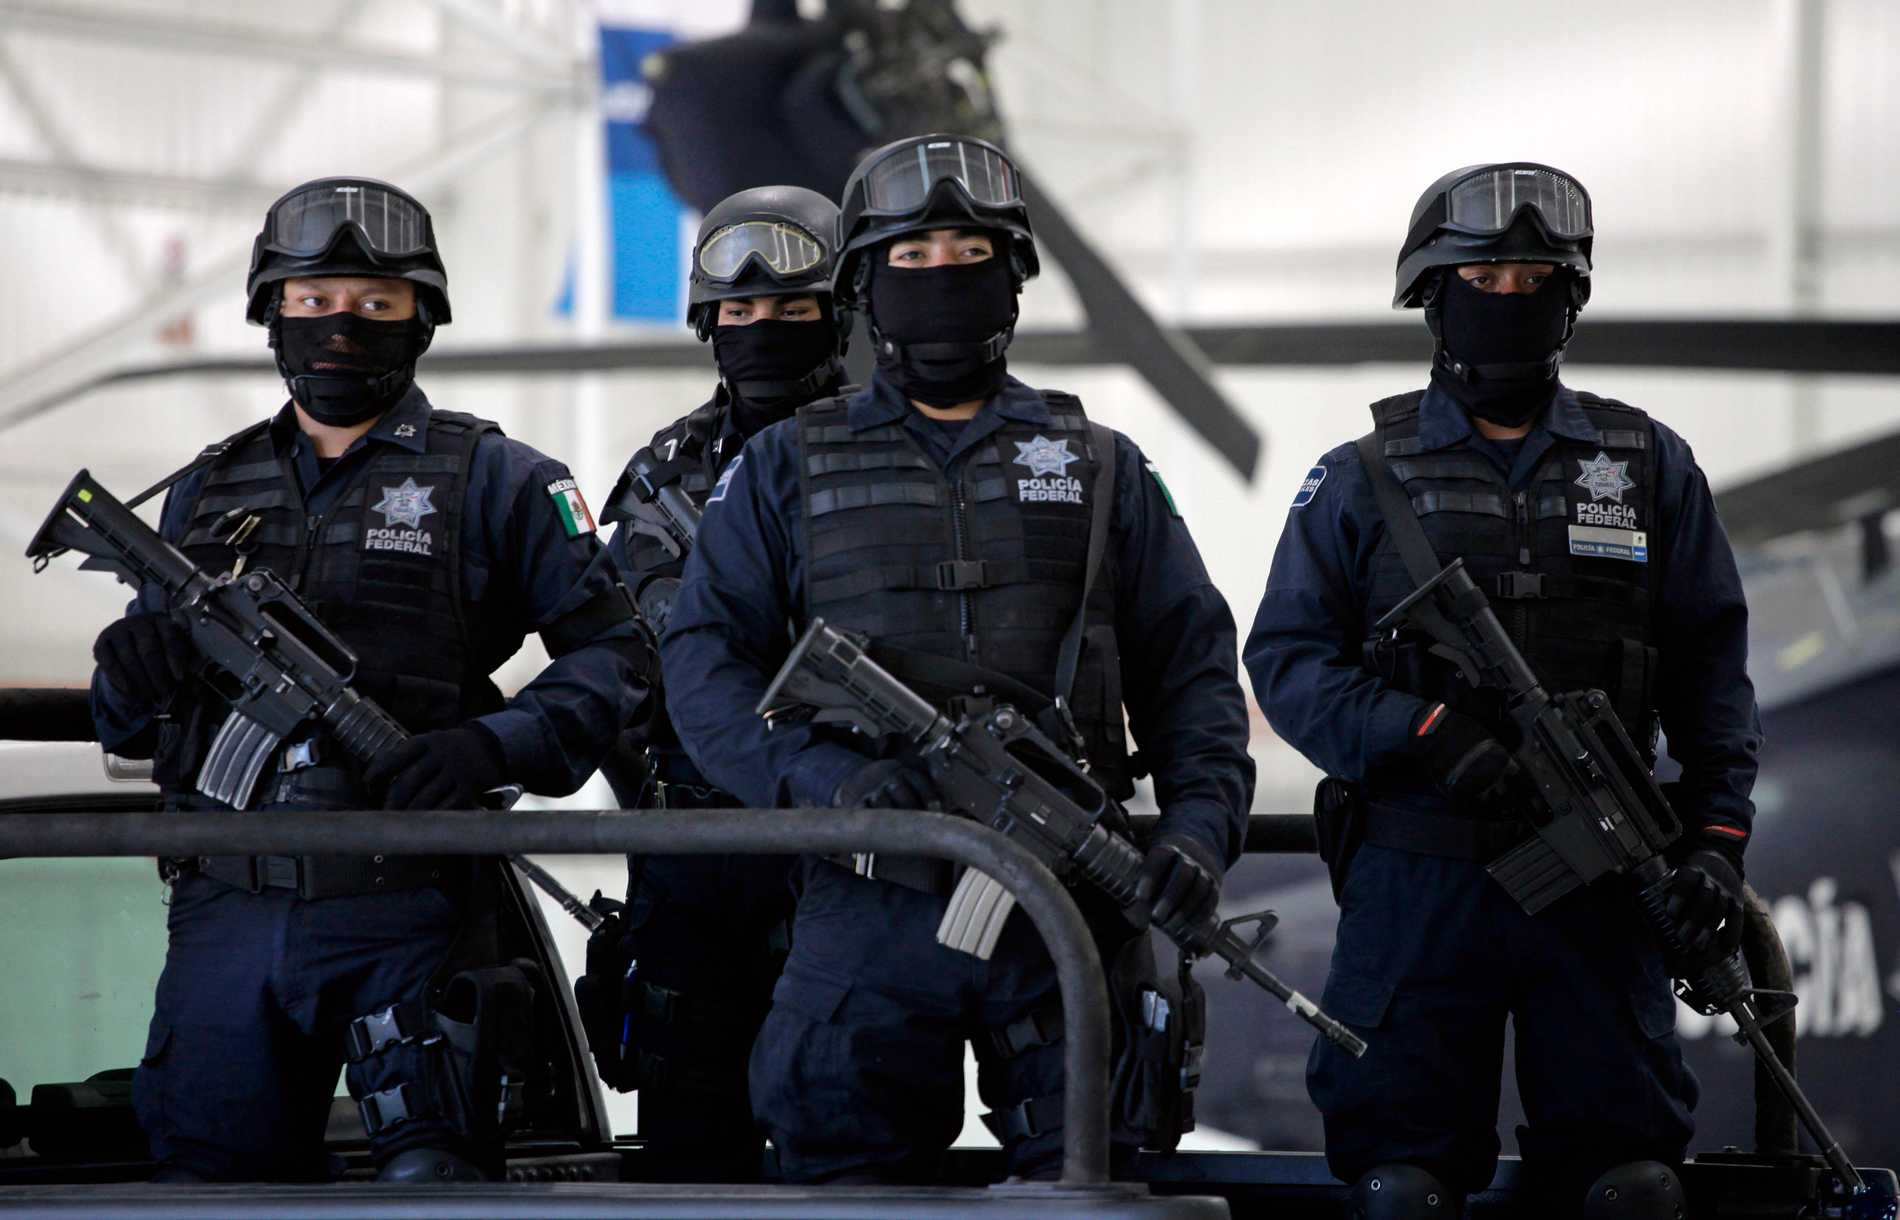 Federal mexikansk polis i delstaten Zacatecas. Arkivbild.